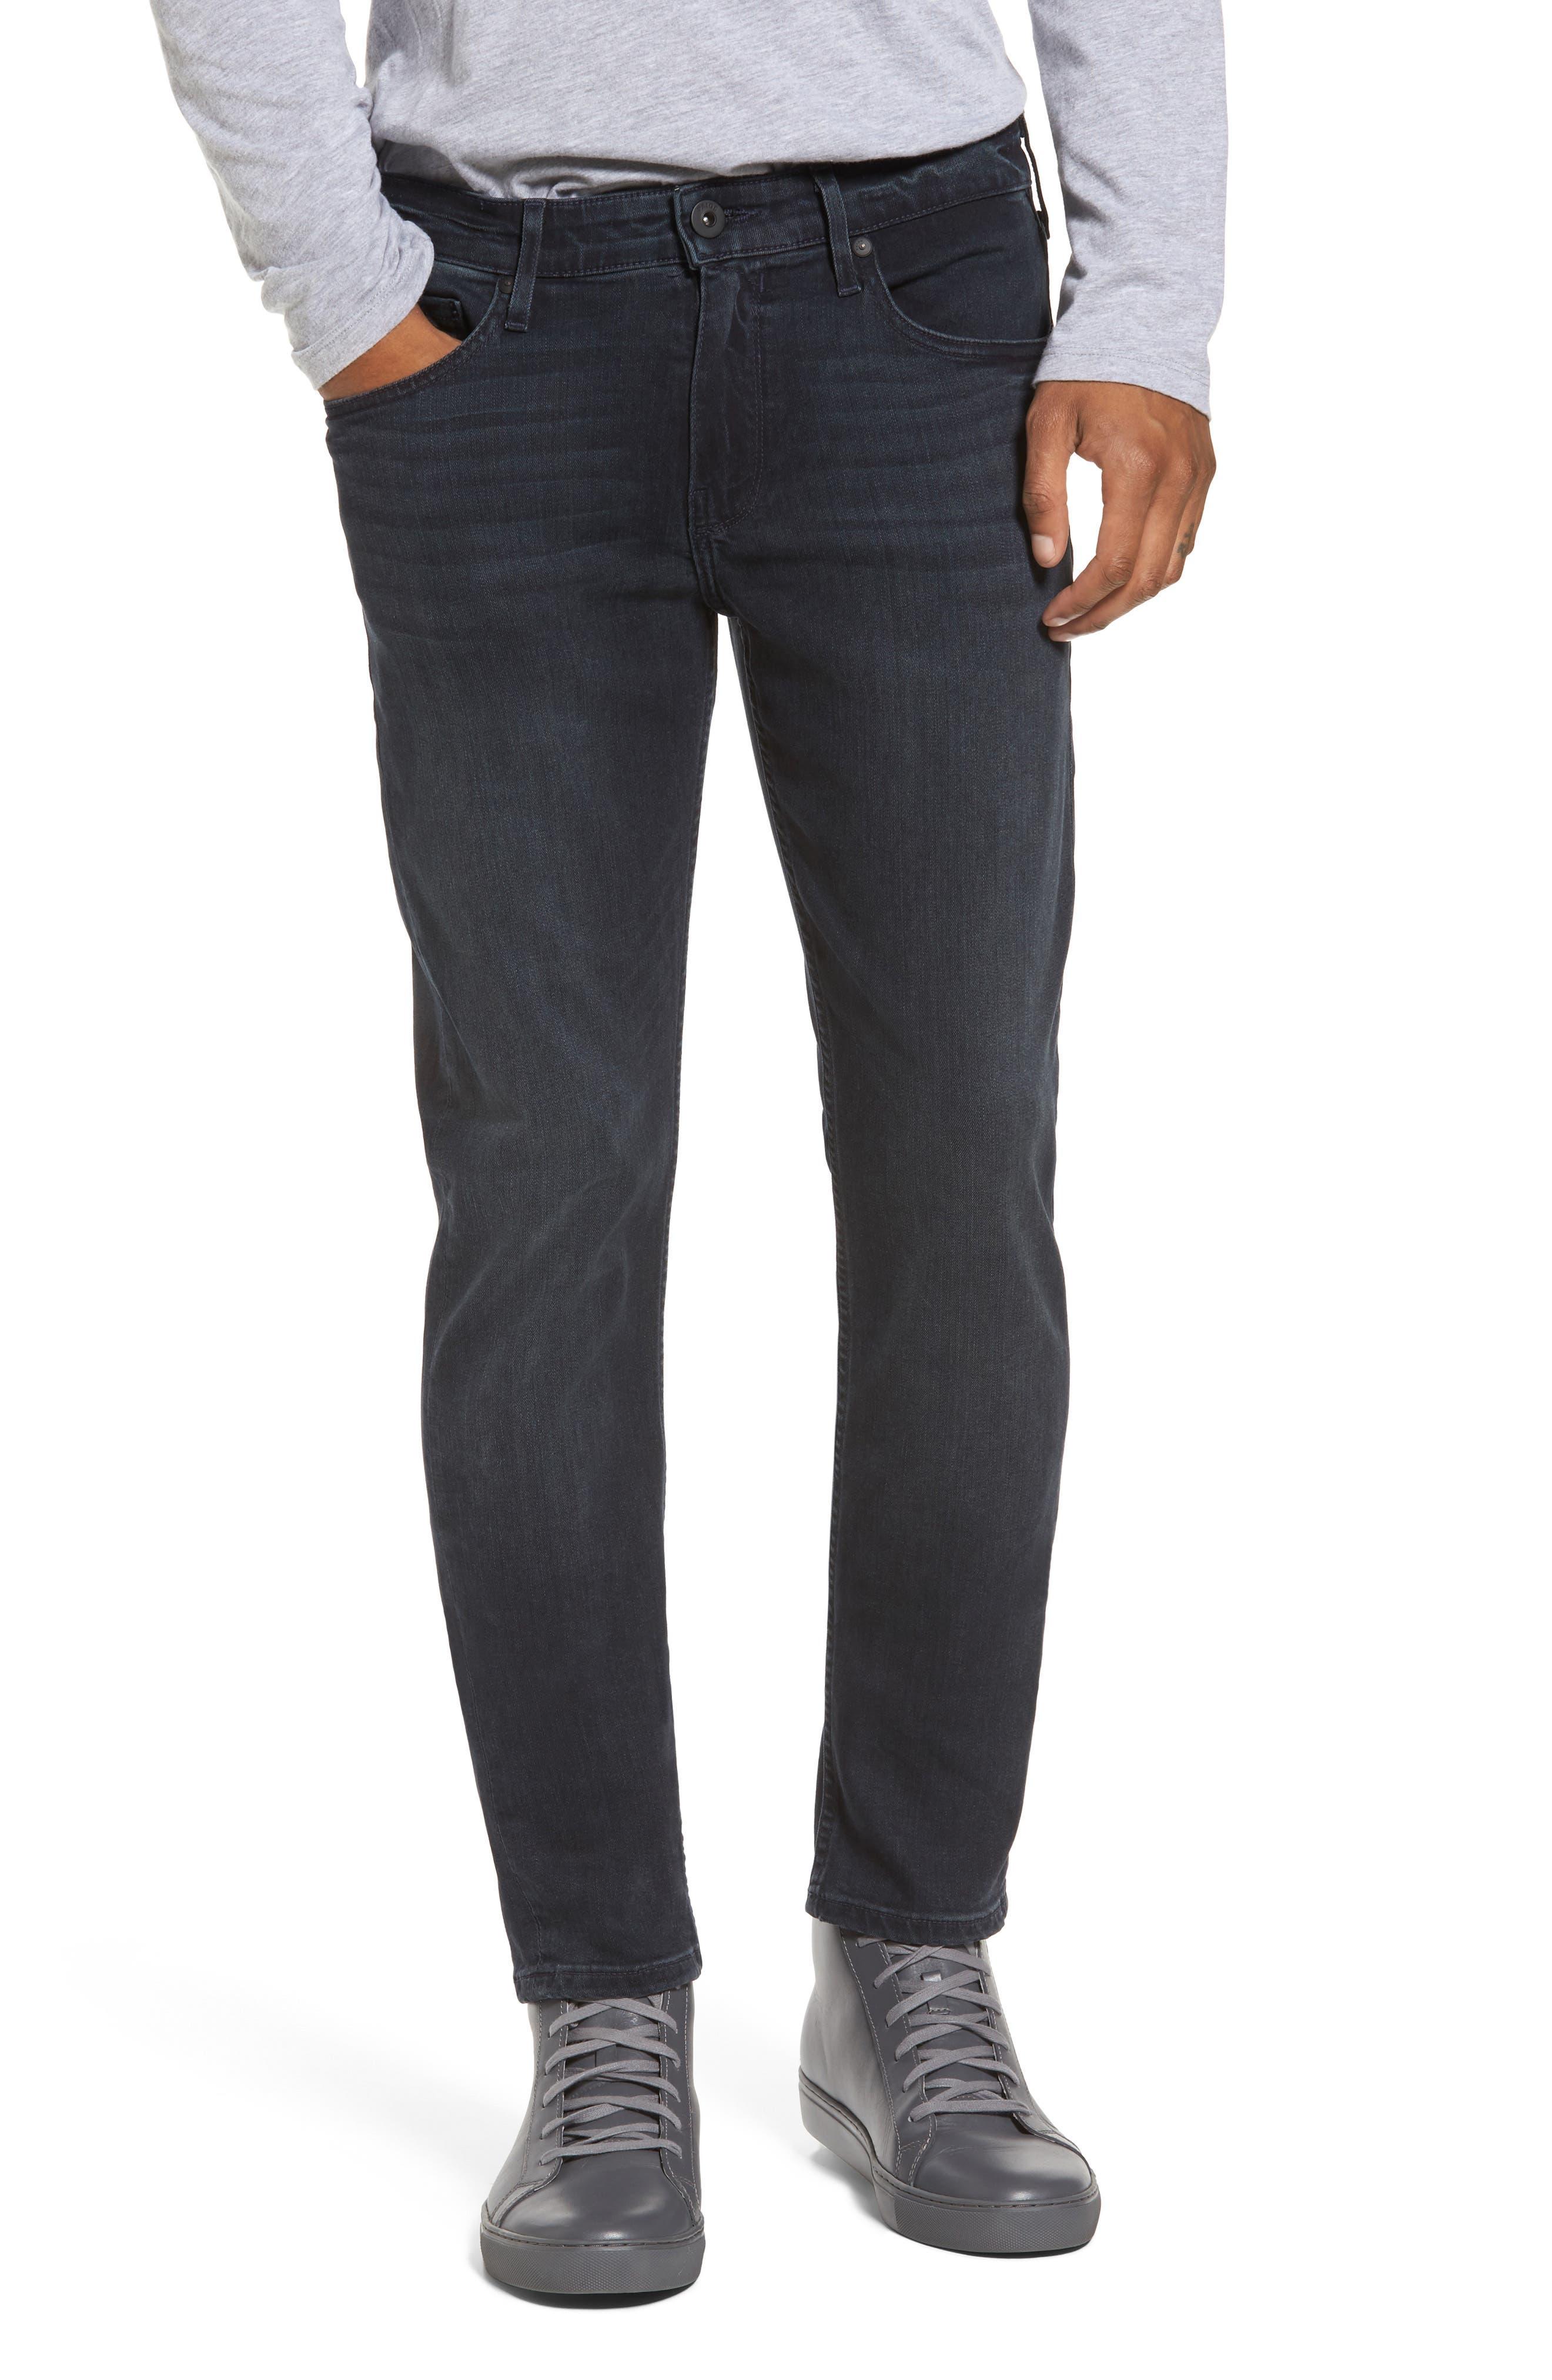 Alternate Image 1 Selected - PAIGE Transcend - Croft Skinny Fit Jeans (Beckett)